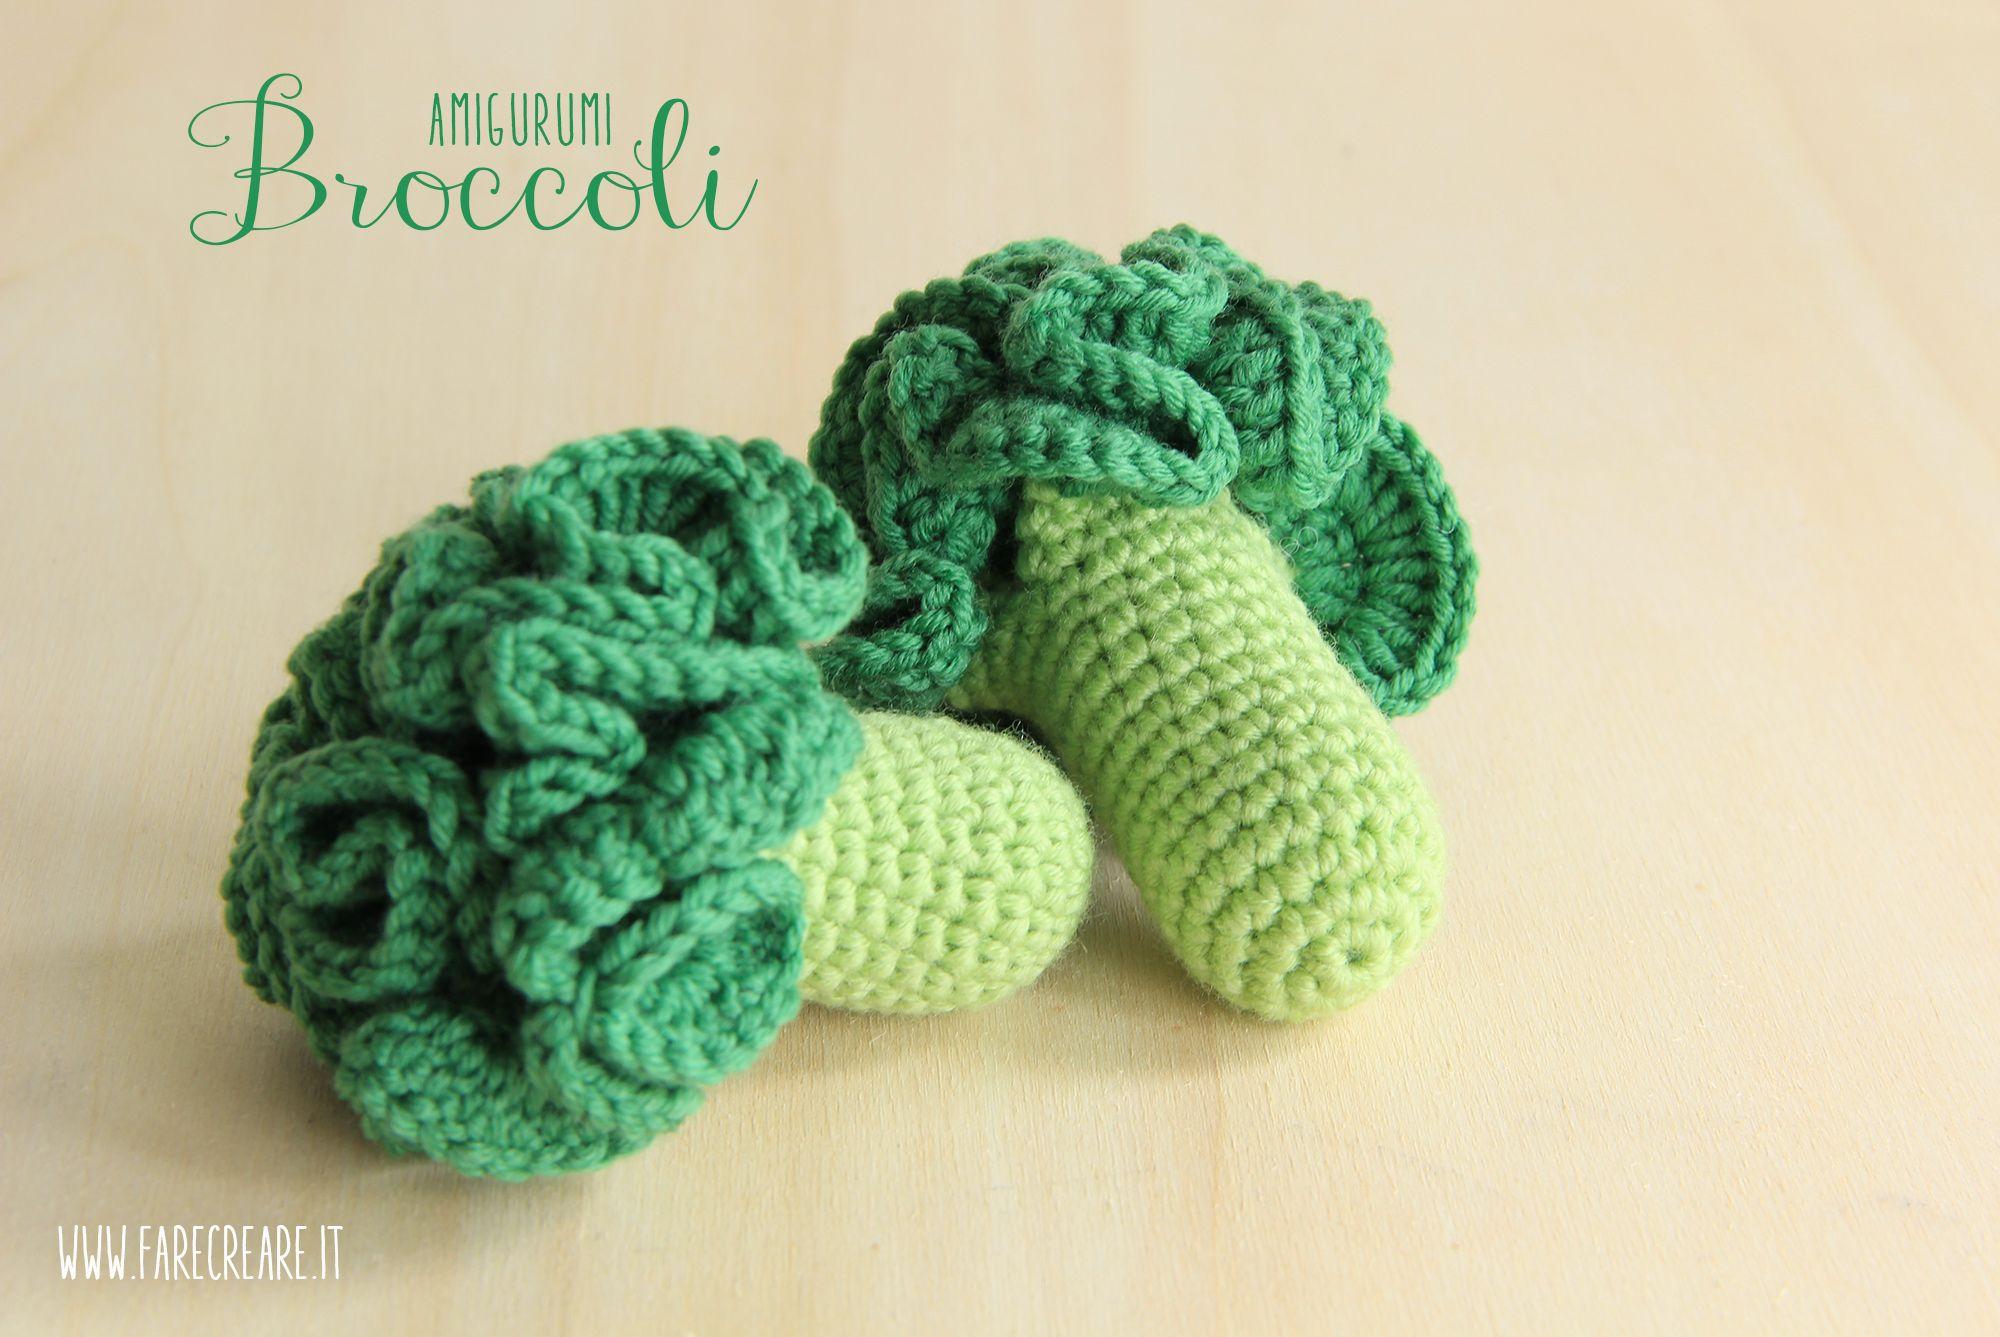 Verdure #amigurumi i broccoli a #uncinetto | DIY Geschenke ...